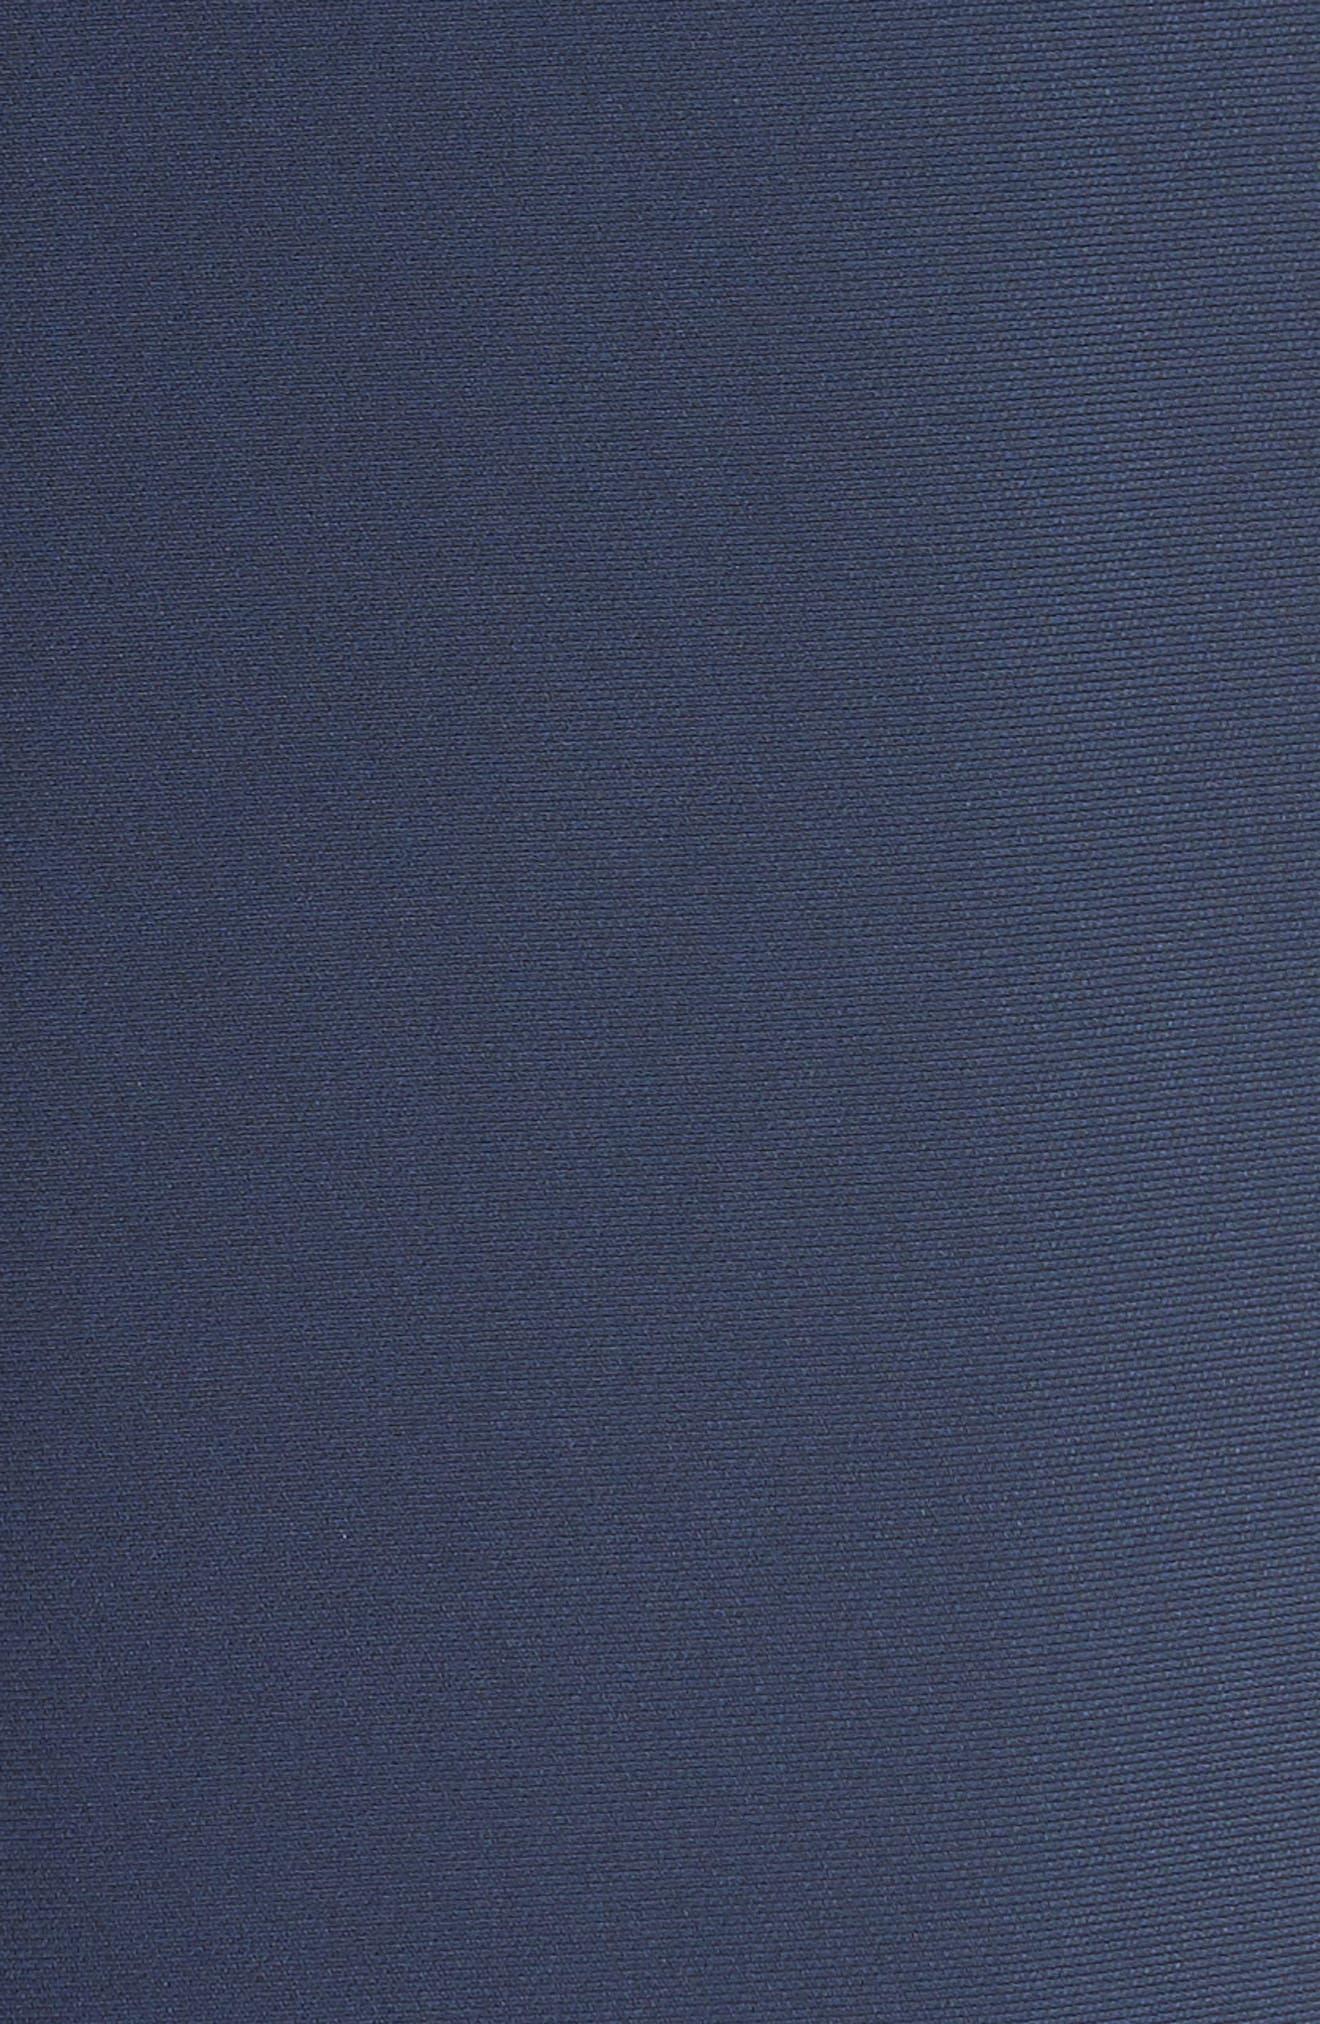 Asymmetrical Belted Dress,                             Alternate thumbnail 6, color,                             Navy